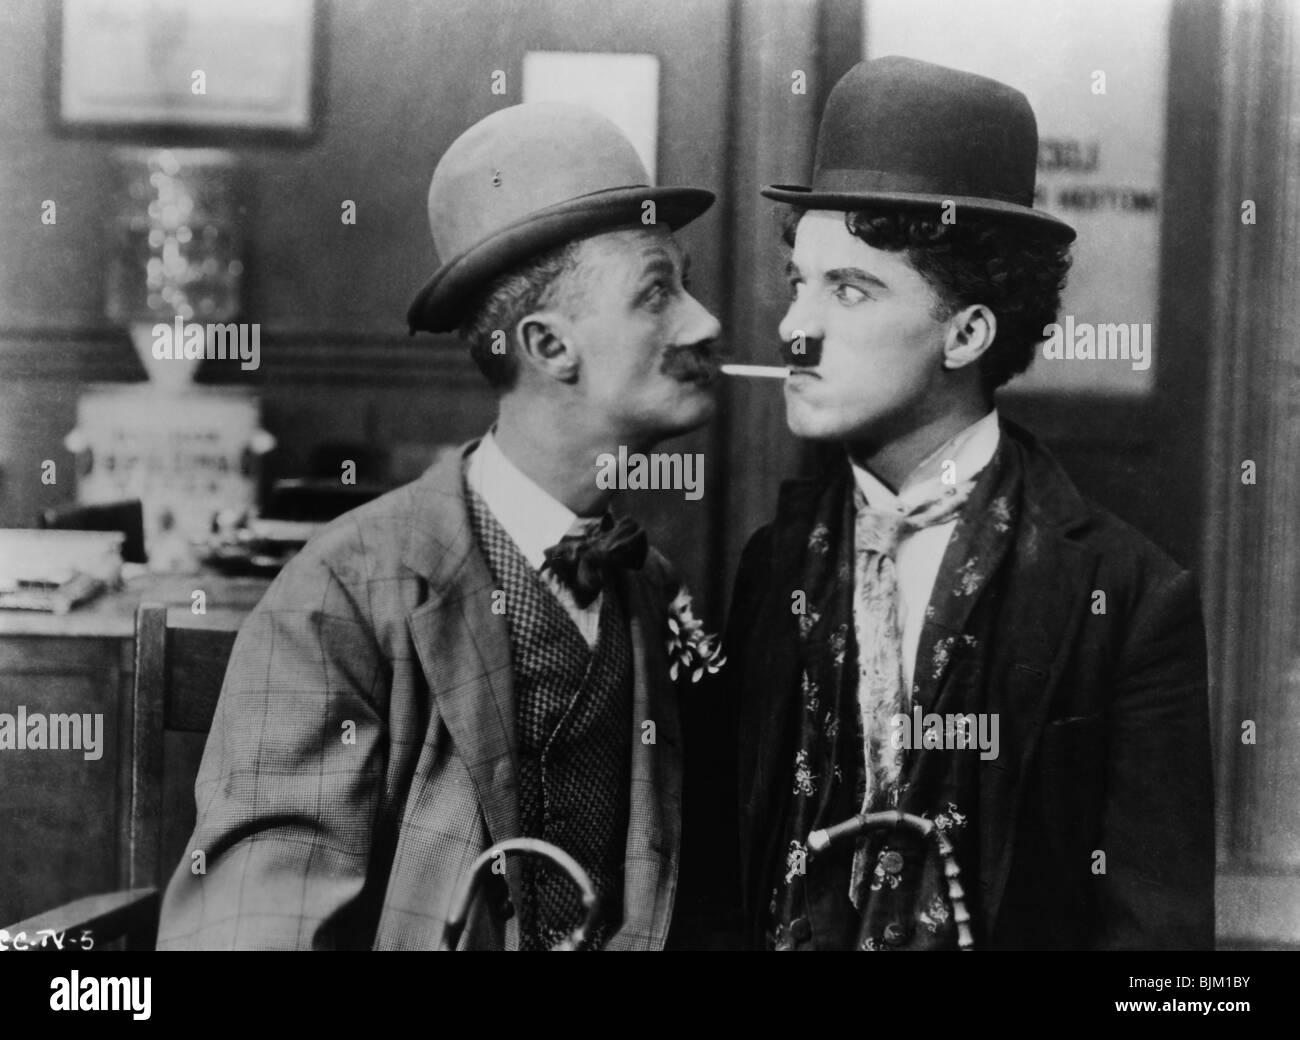 HIS NEW PROFESSION (1914) CHARLIE CHAPLIN, BEN TURPIN CHARLIE CHAPLIN (DIR) 001 - Stock Image